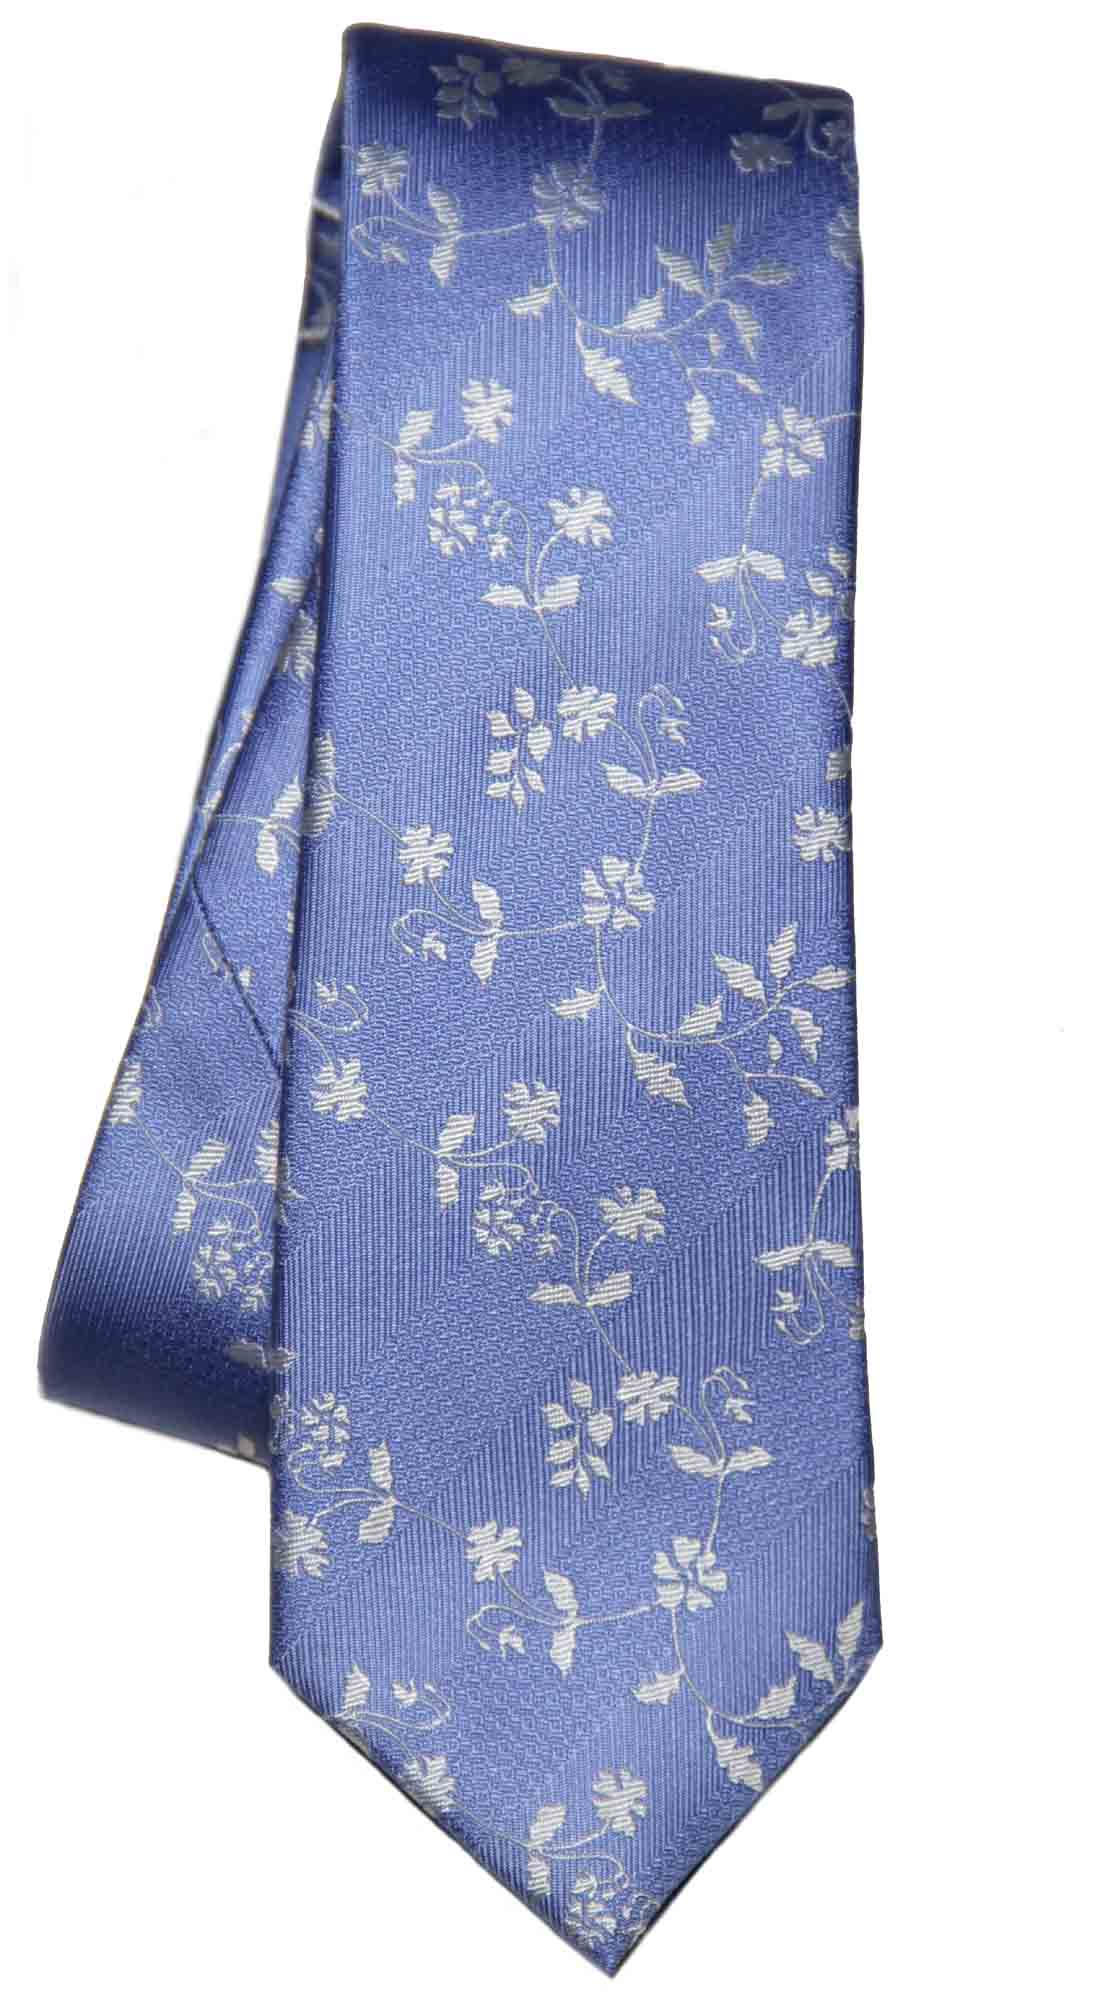 Tresanti Reale Silk Tie Blue White Floral Men's Long